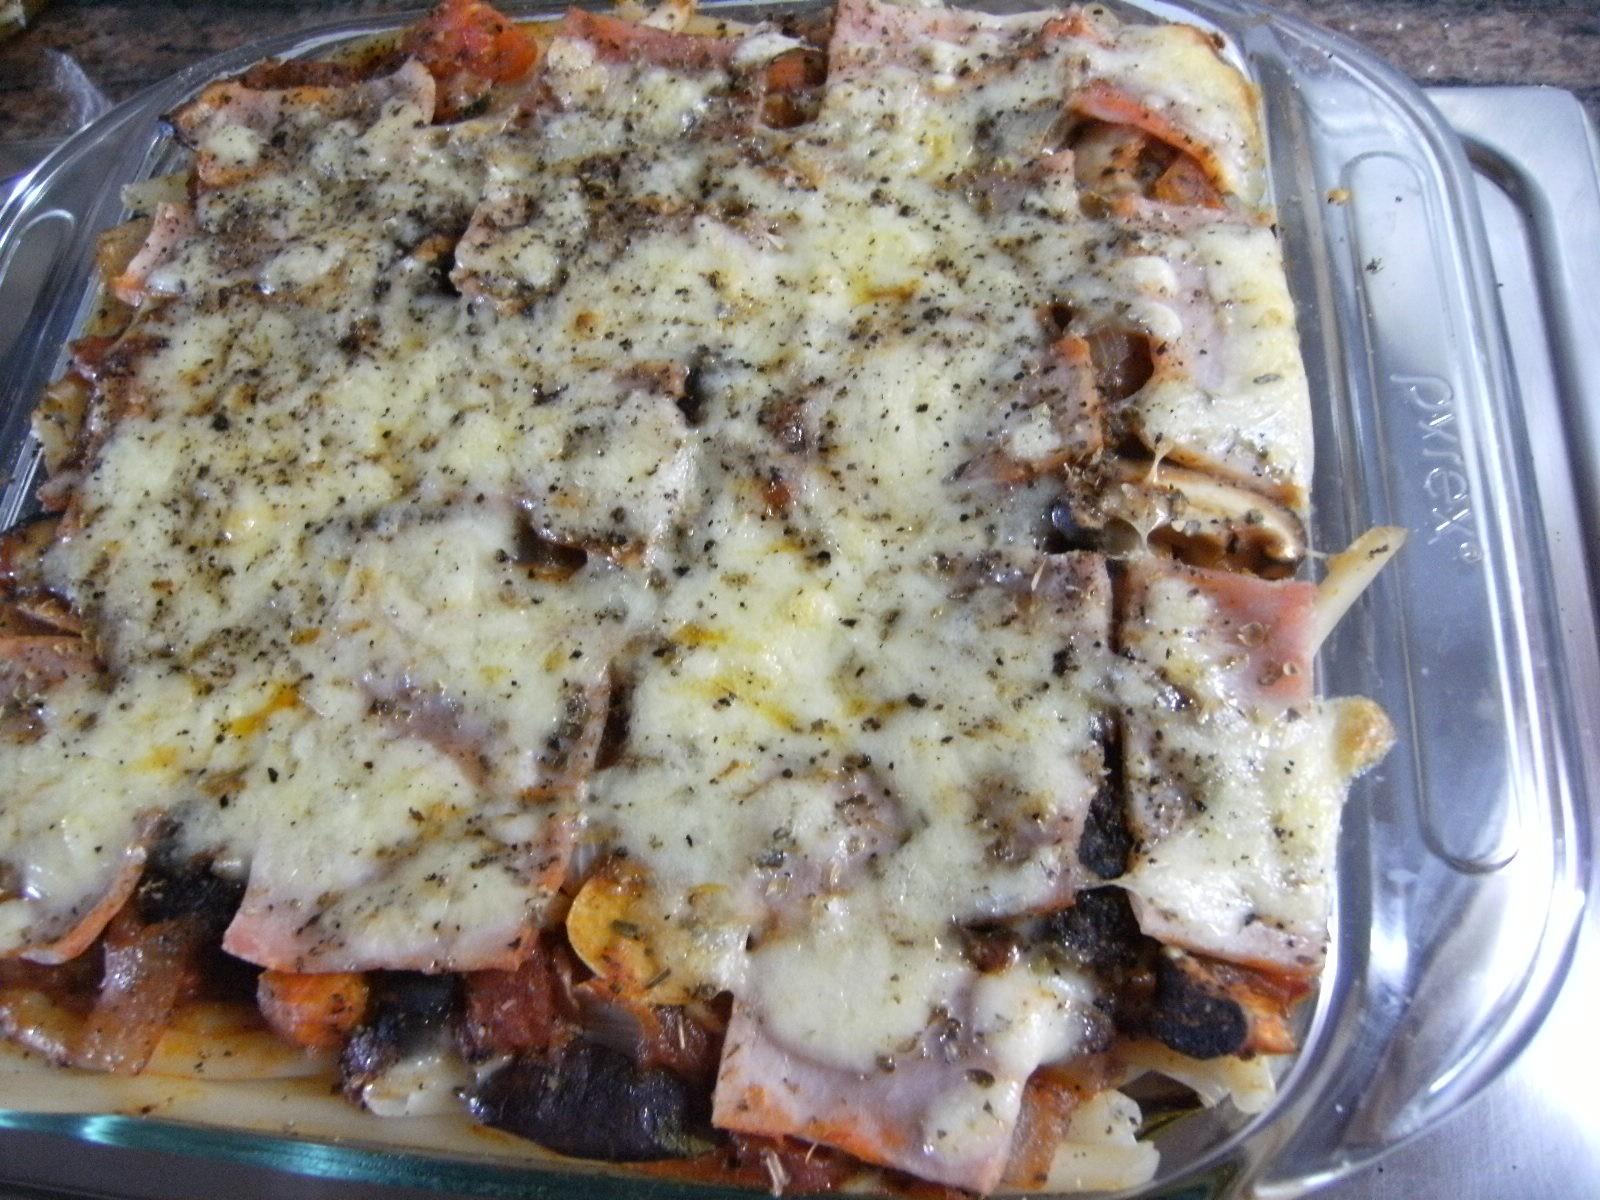 fertige Makkaroni-Lasagne